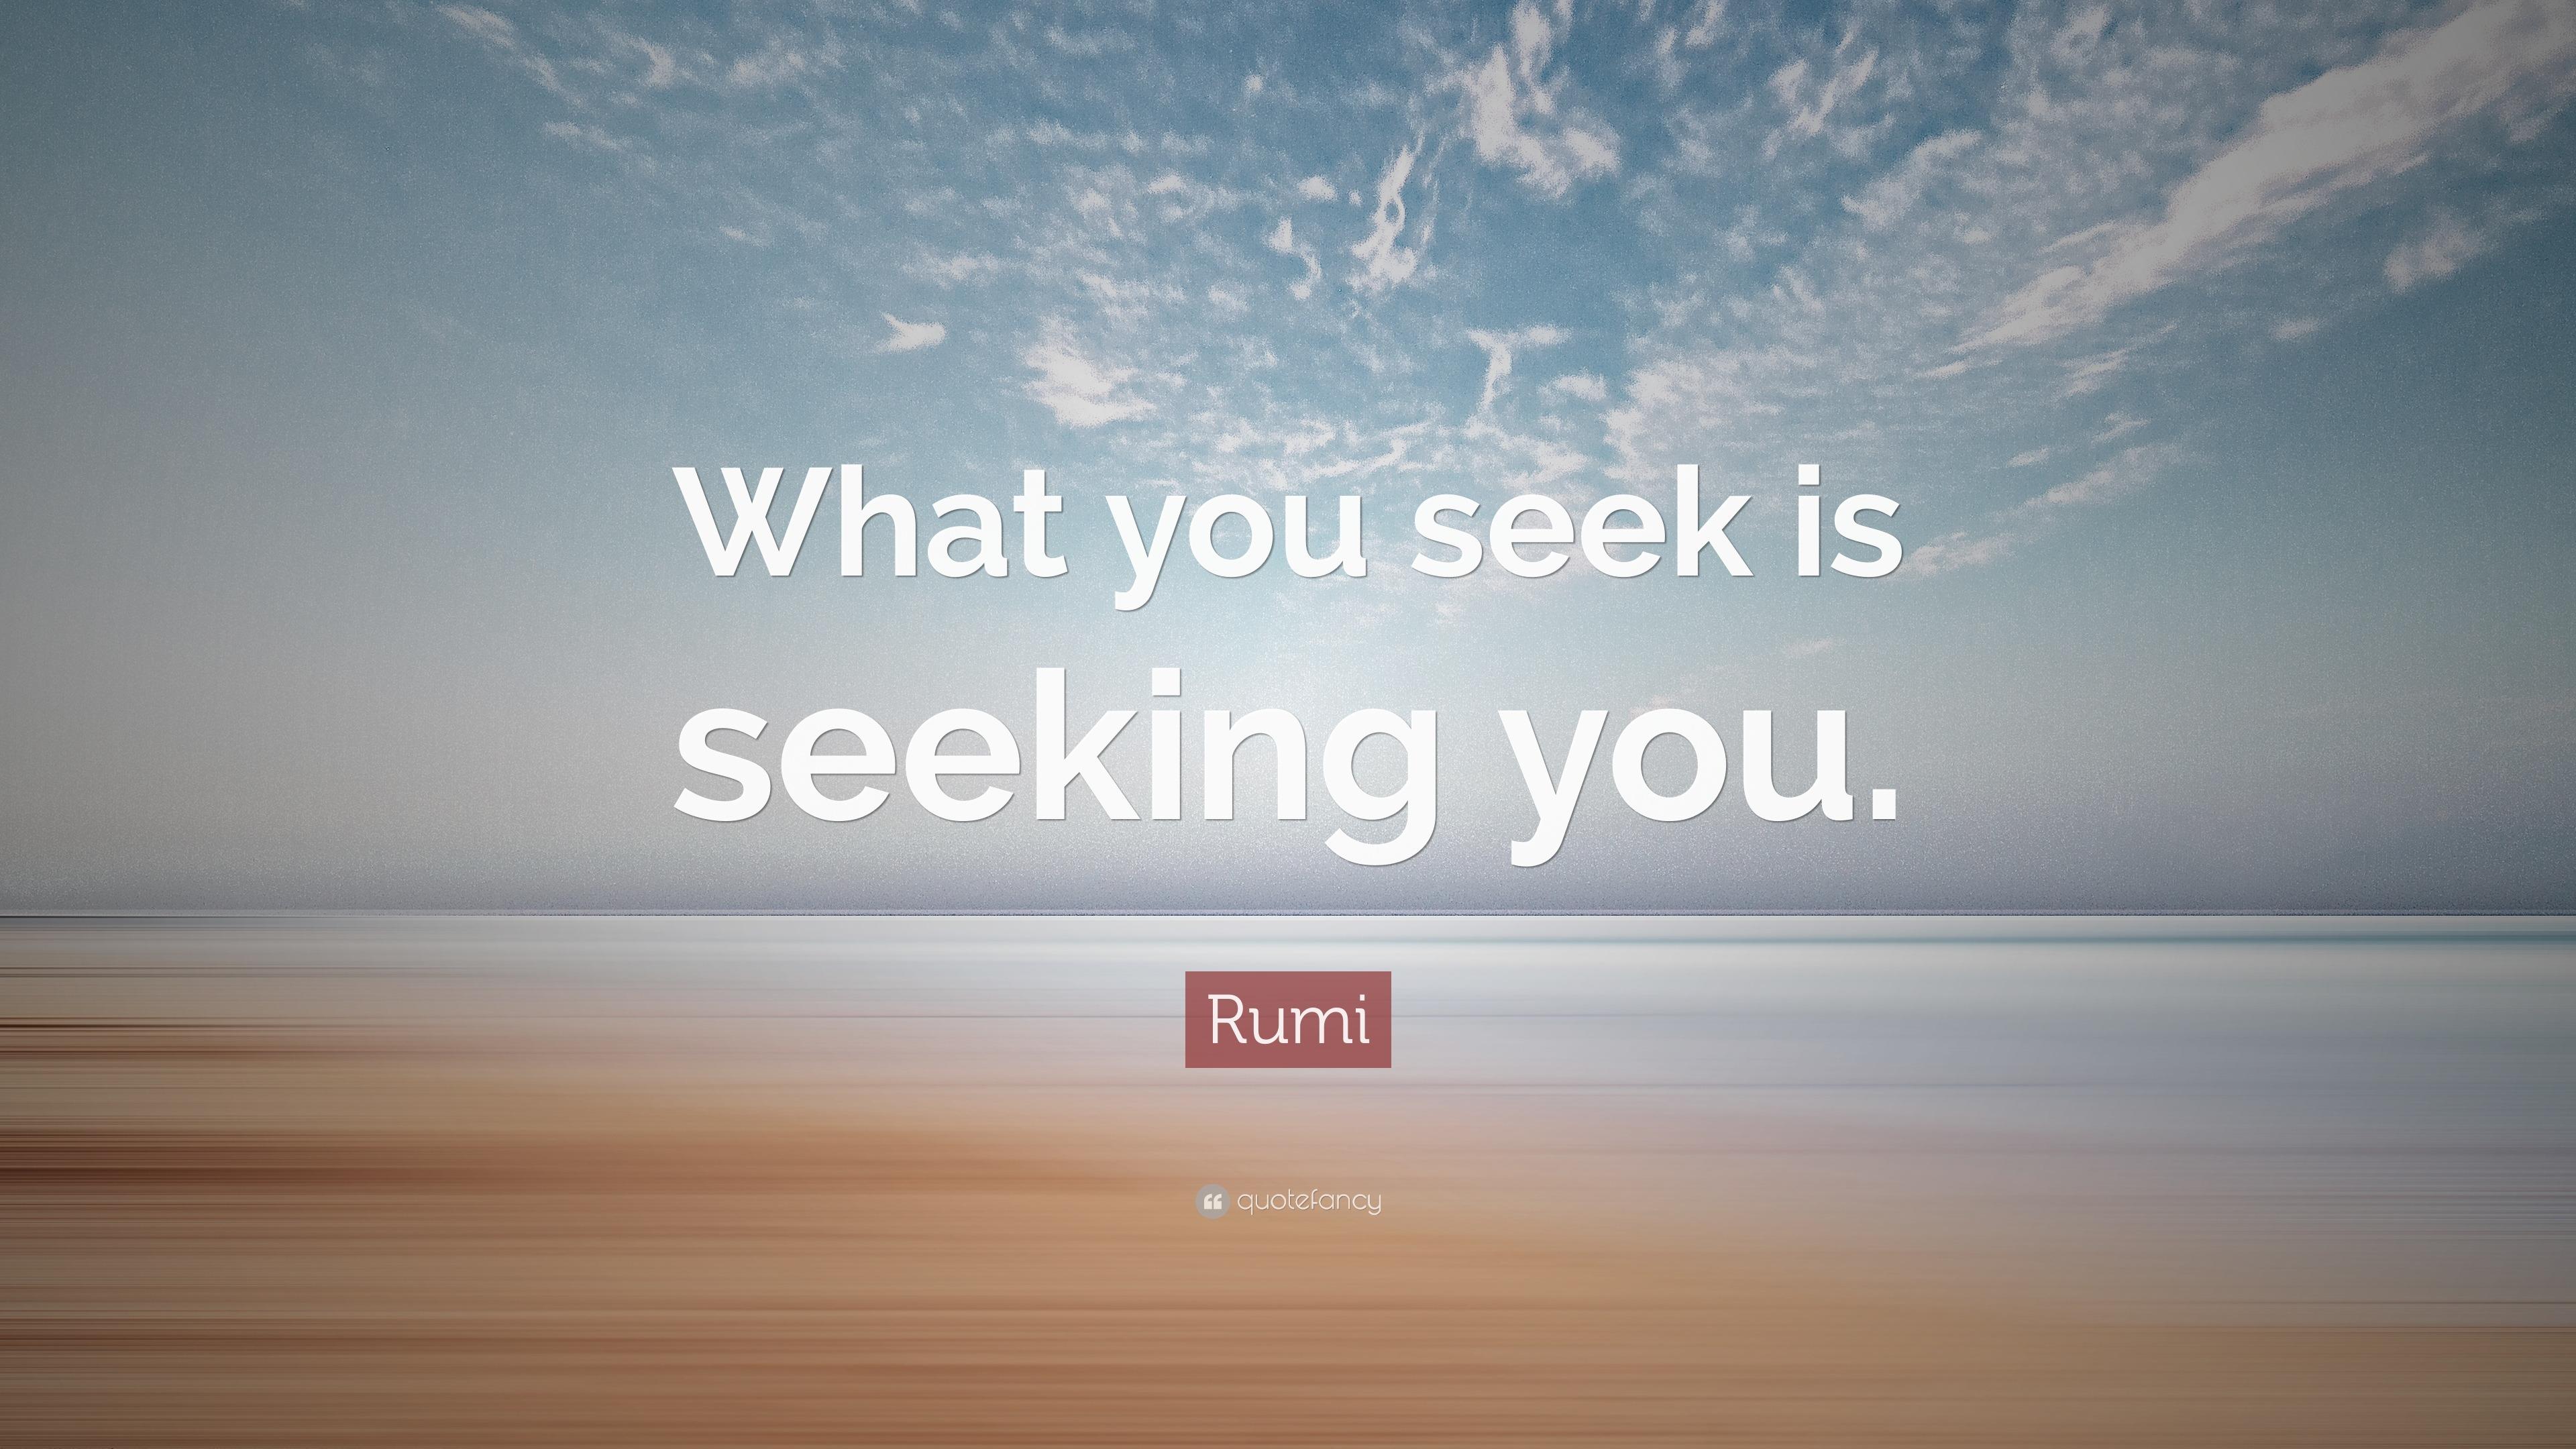 John Lennon Wallpaper Quotes Rumi Quote What You Seek Is Seeking You 23 Wallpapers